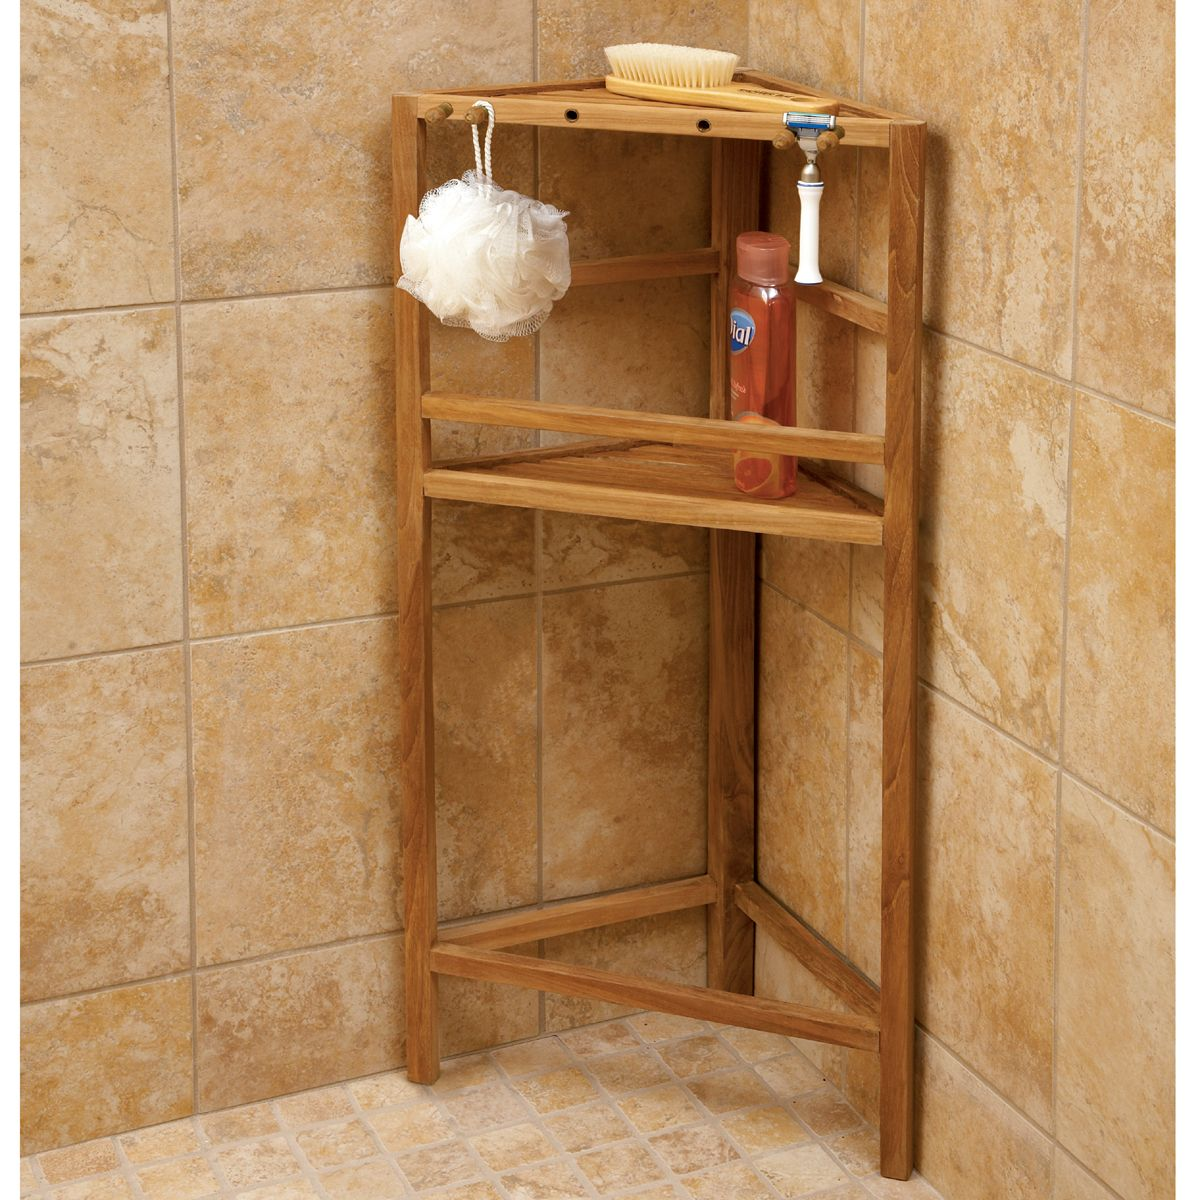 Teak Shower Shelving With Images Teak Shower Shelf Teak